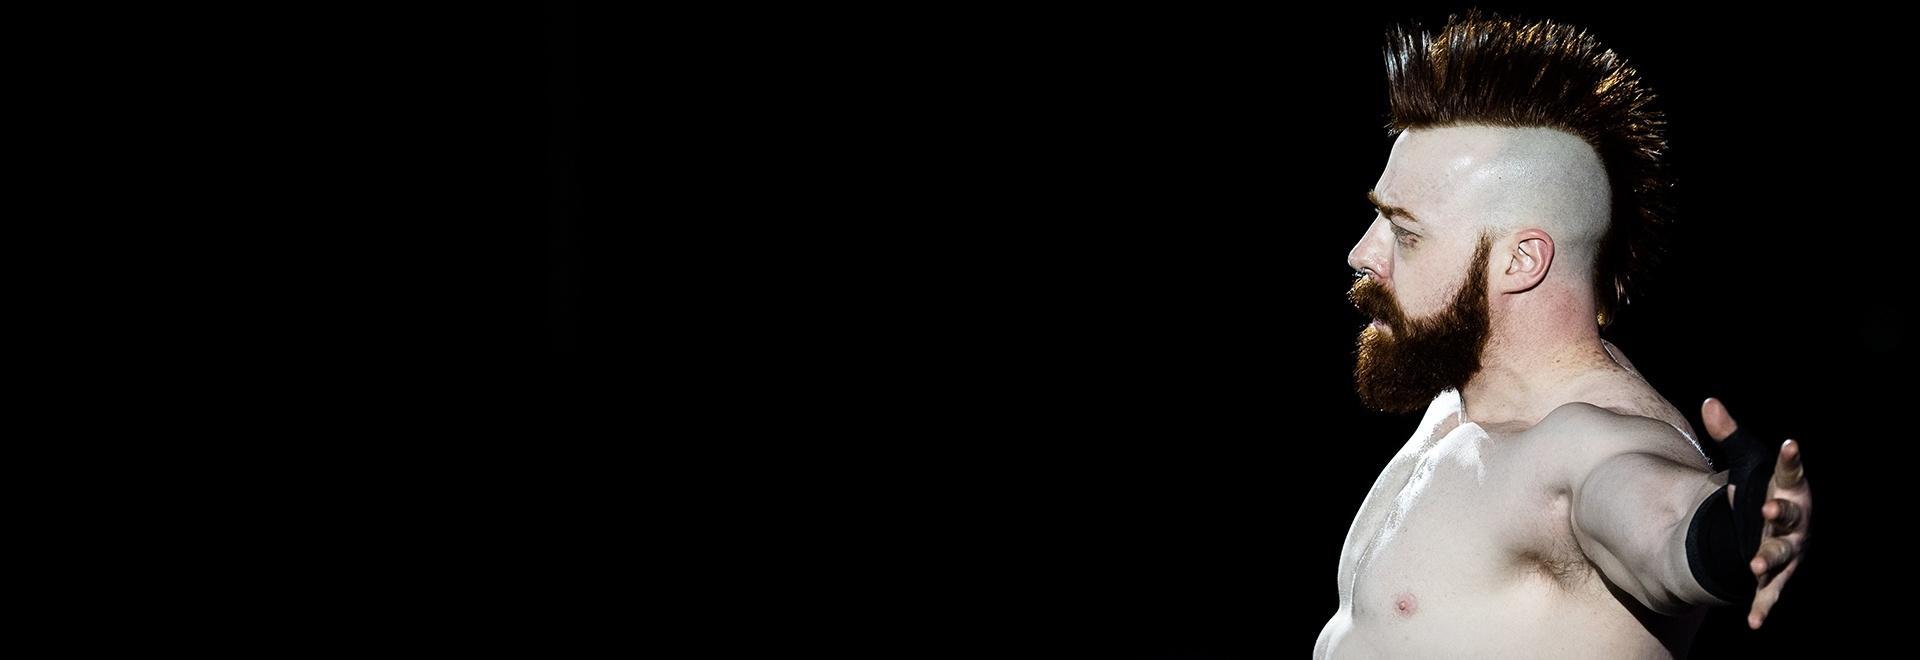 Ep. 234